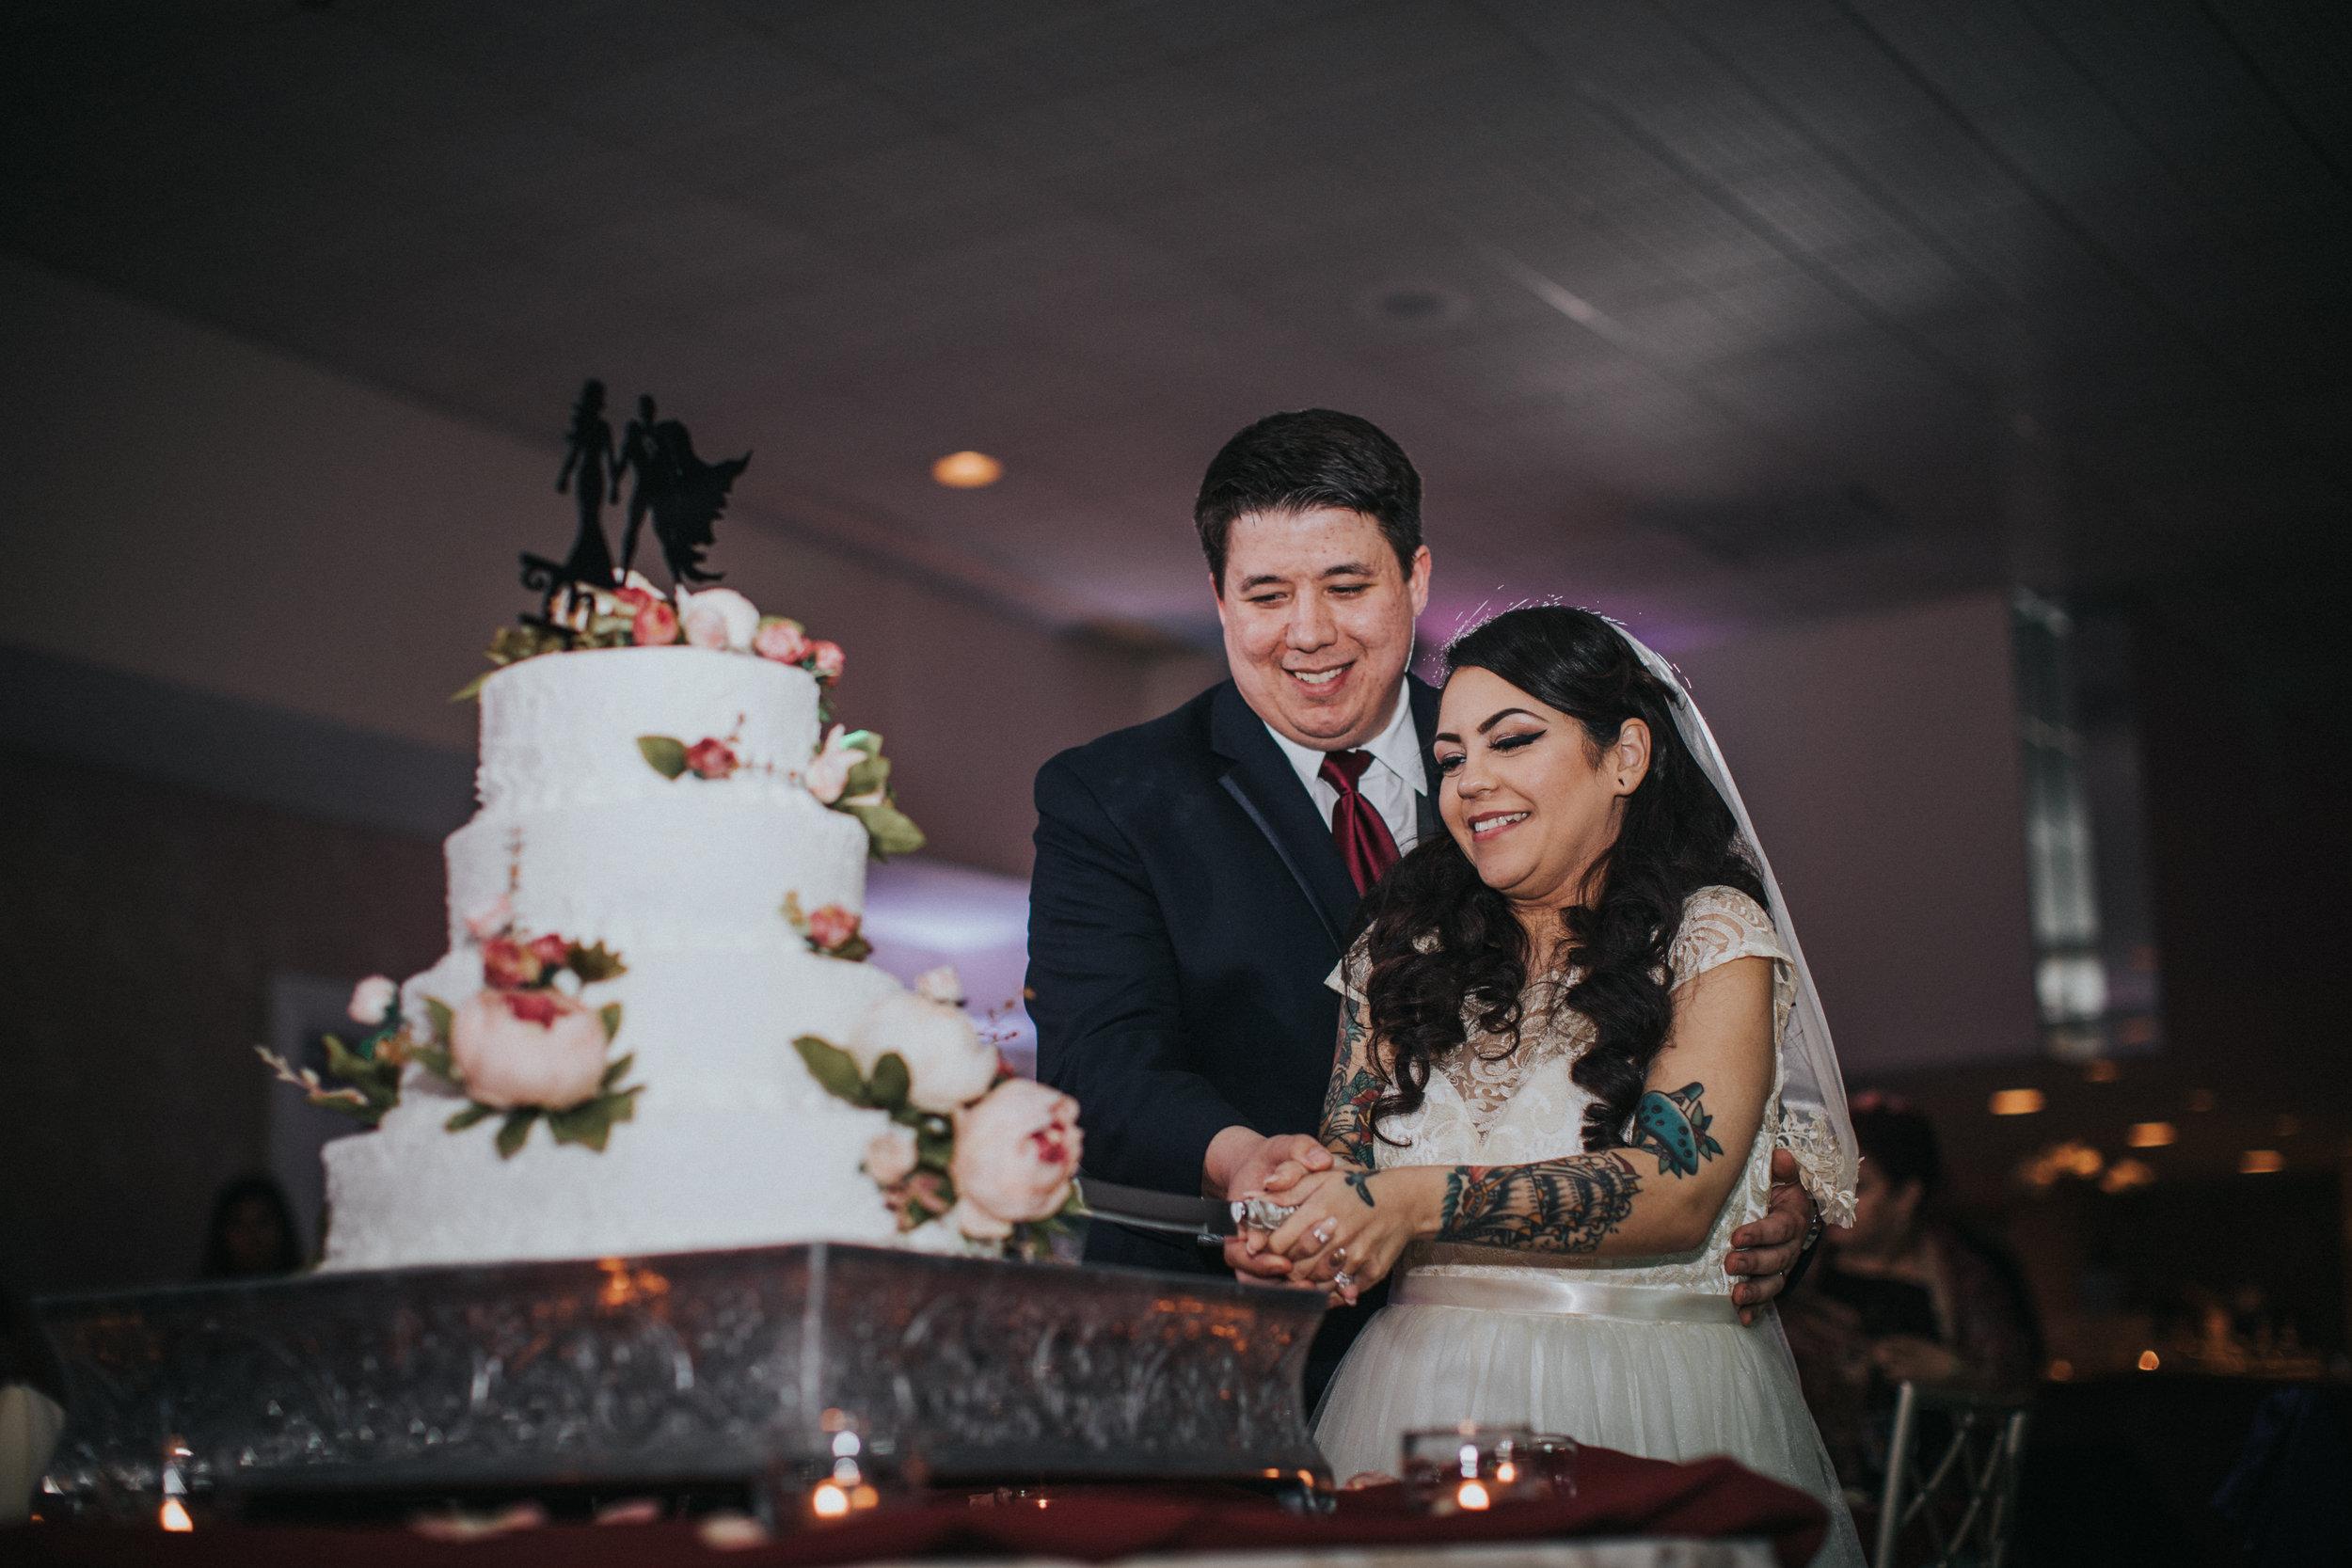 New-Jersey-Wedding-Photographer-ReceptionCenter-Valeria&Mike-Reception (245 of 265).jpg